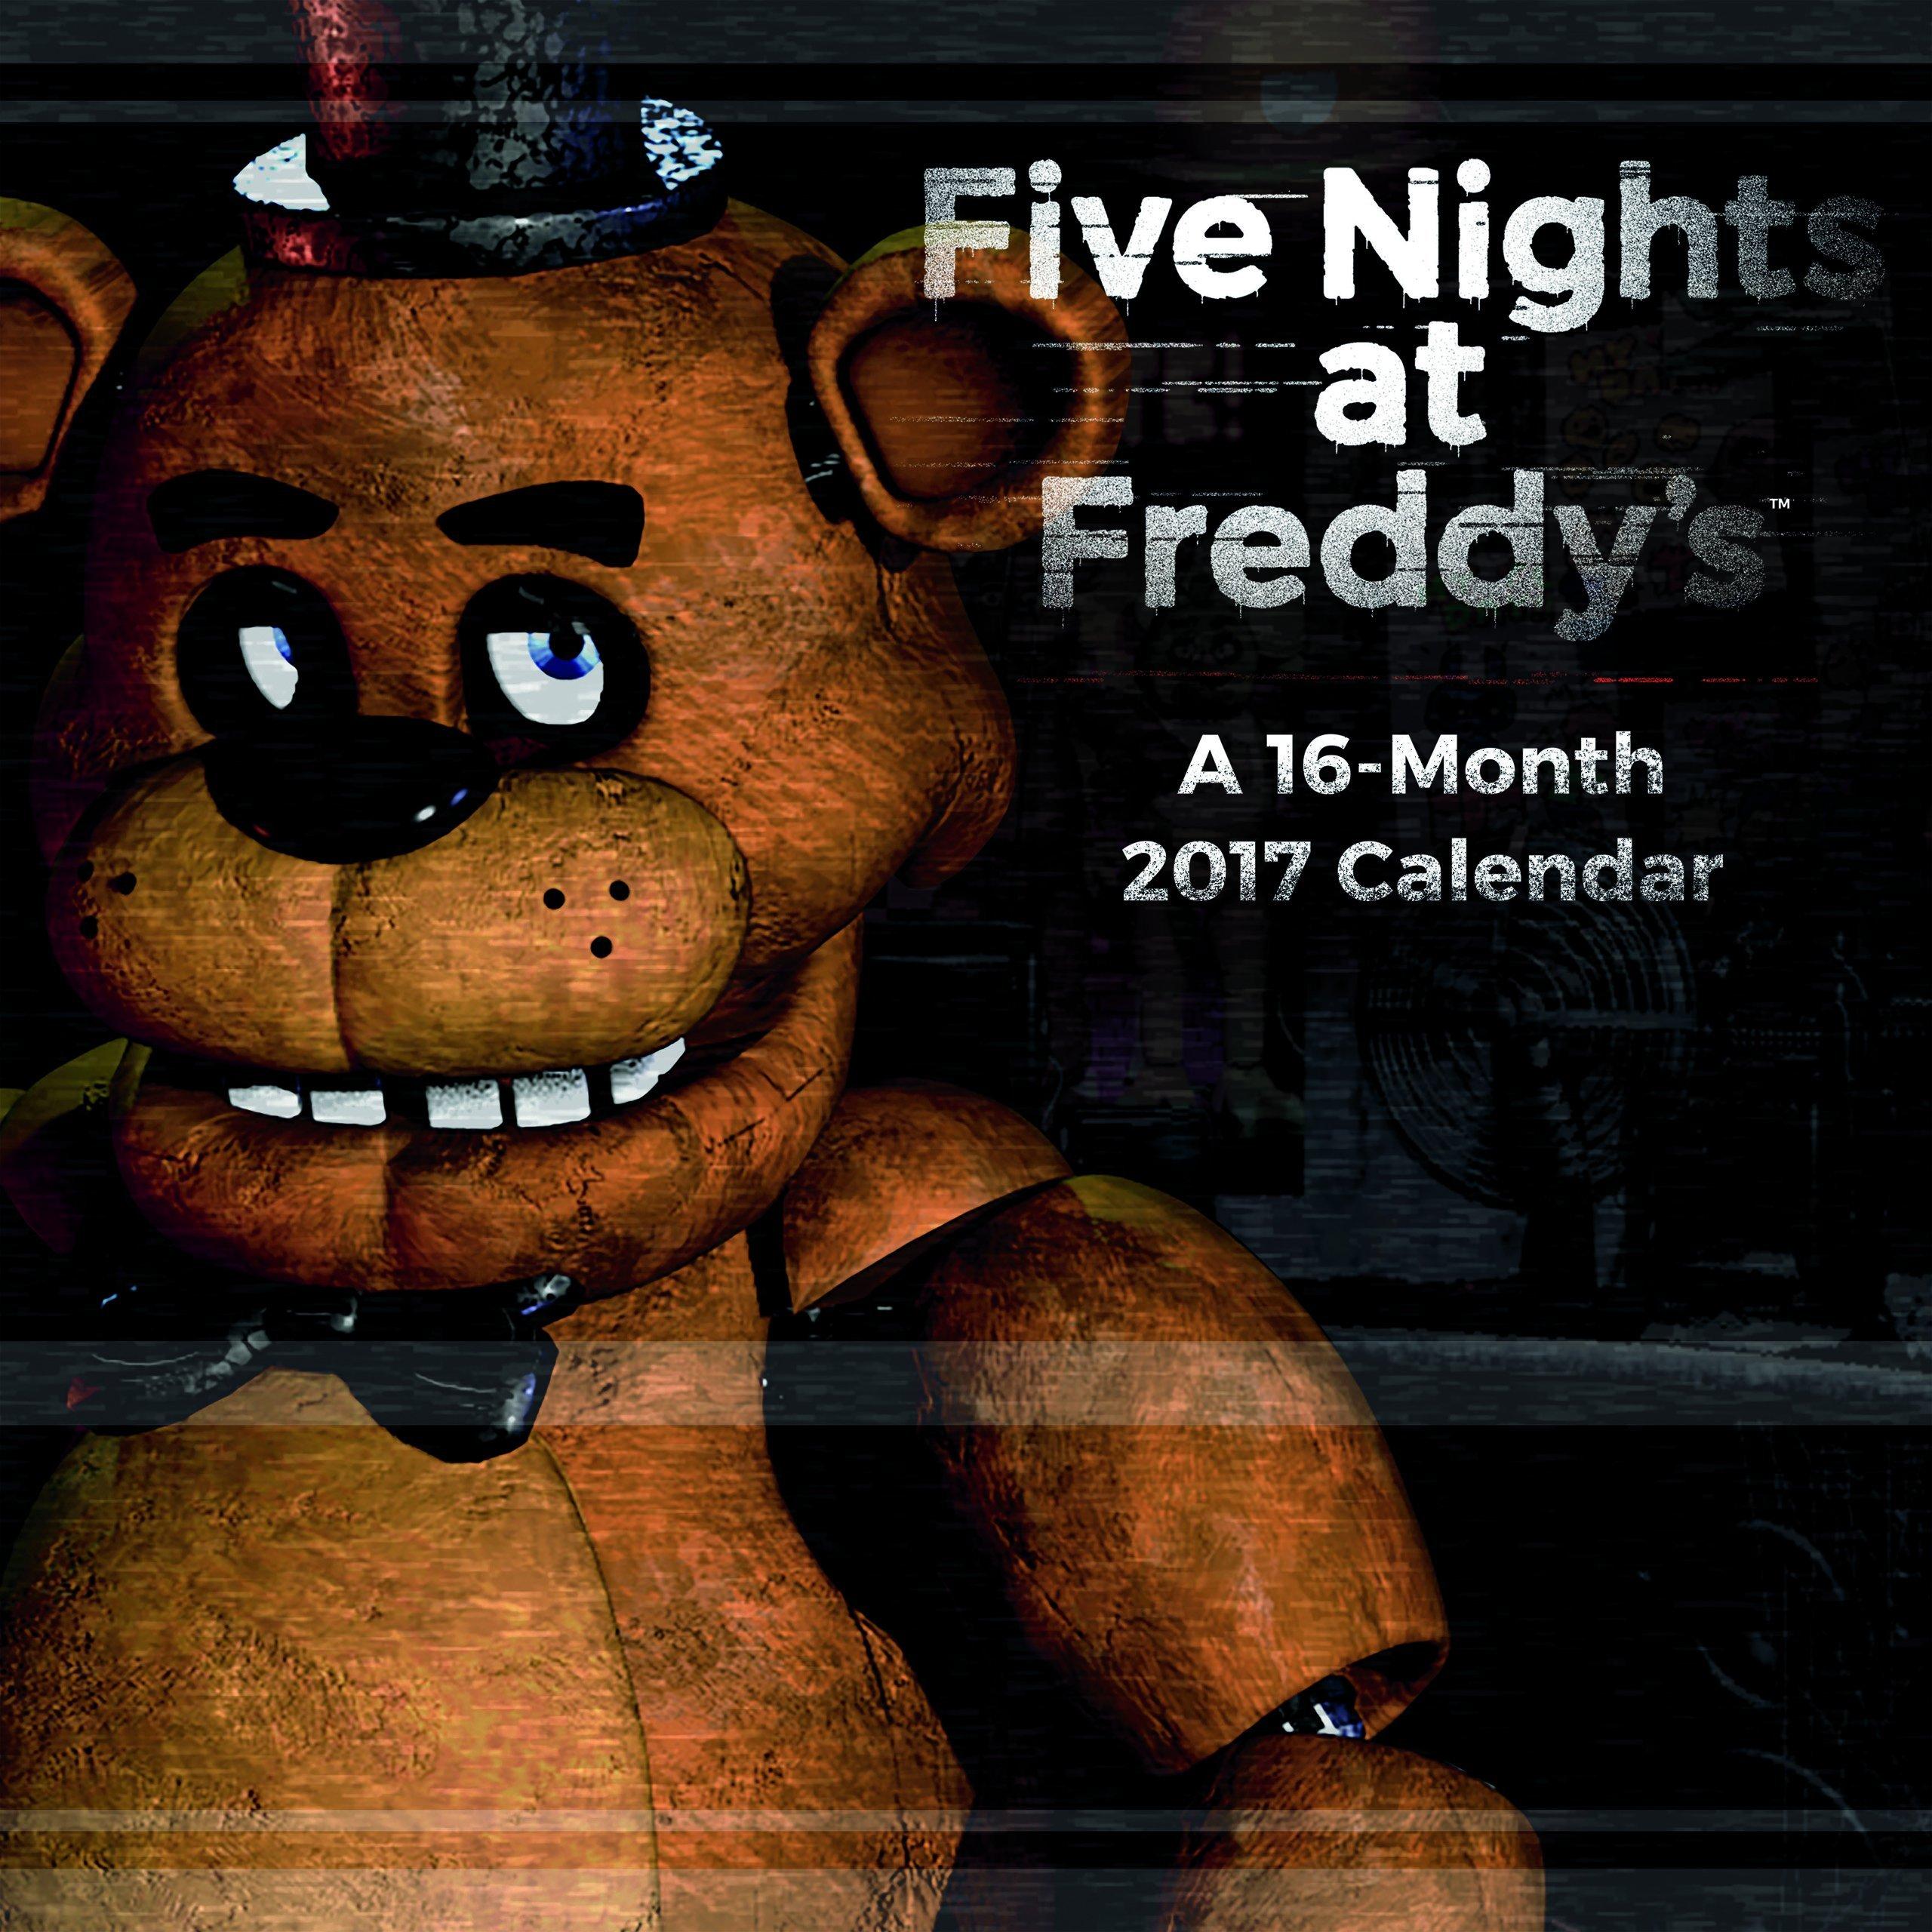 trends international 2017 wall calendar september 2016 december 2017 115 x 115 american horror story